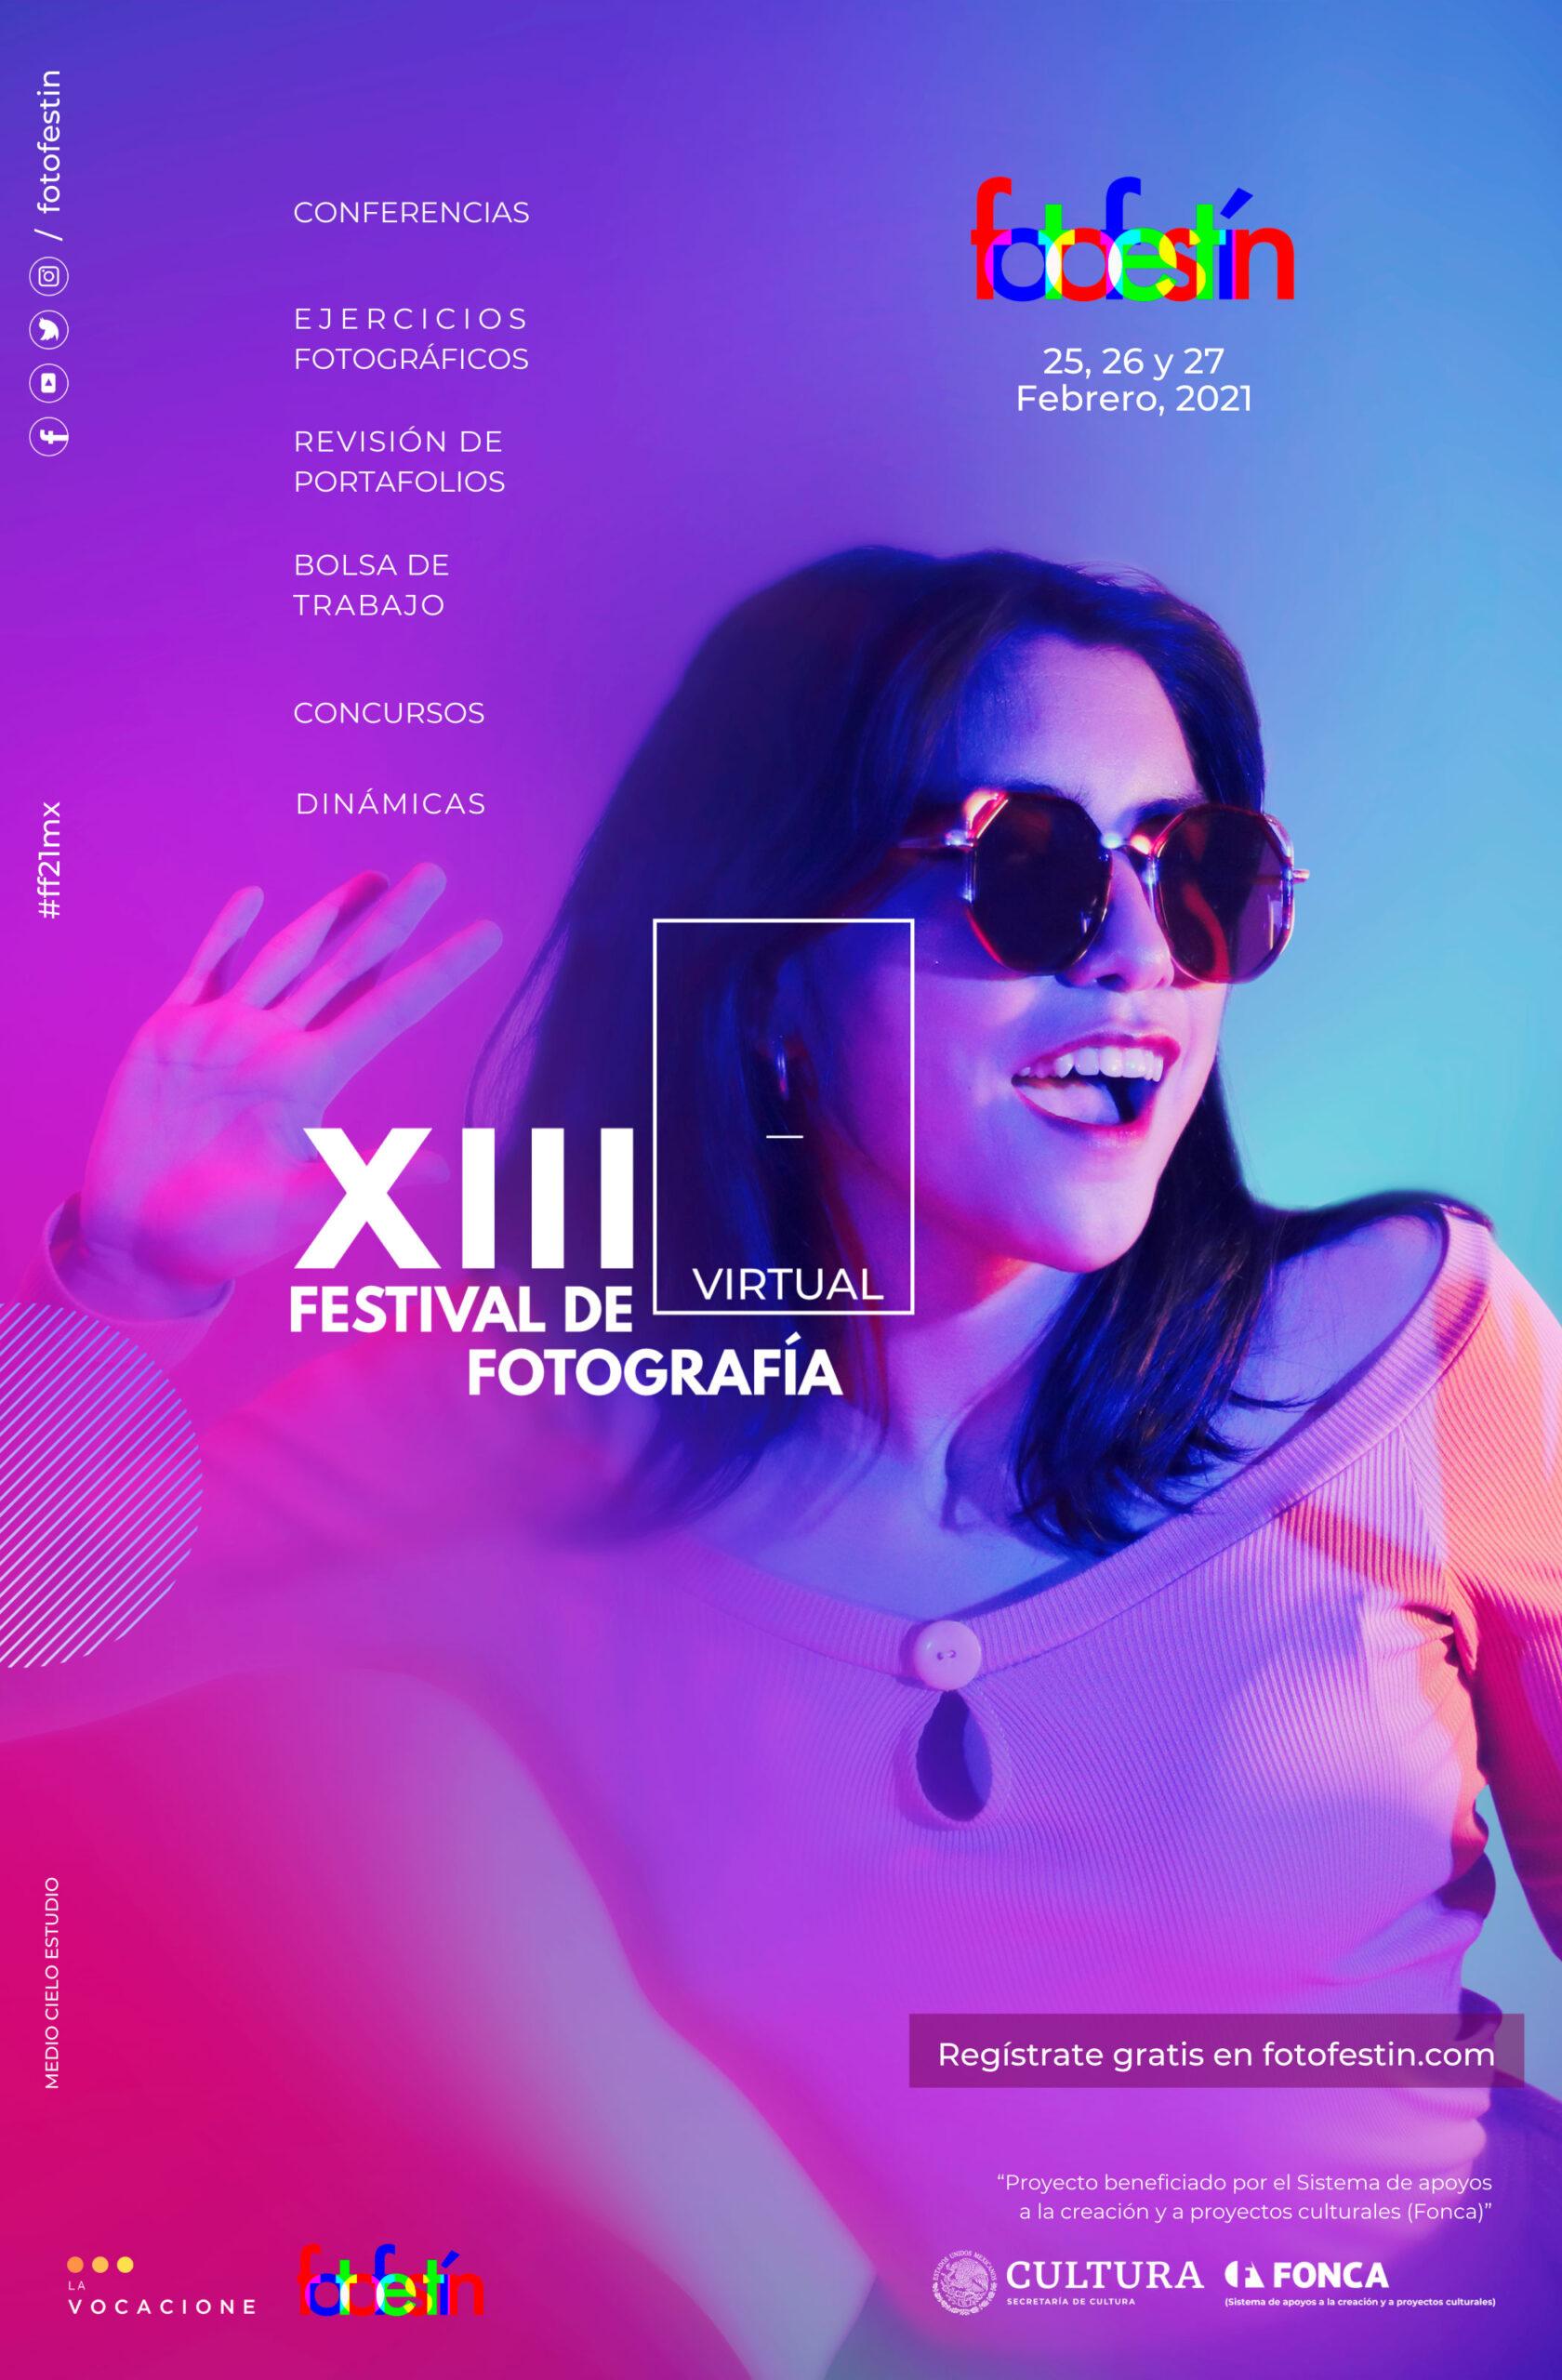 XIII Festival de Fotografía fotofestín 2021